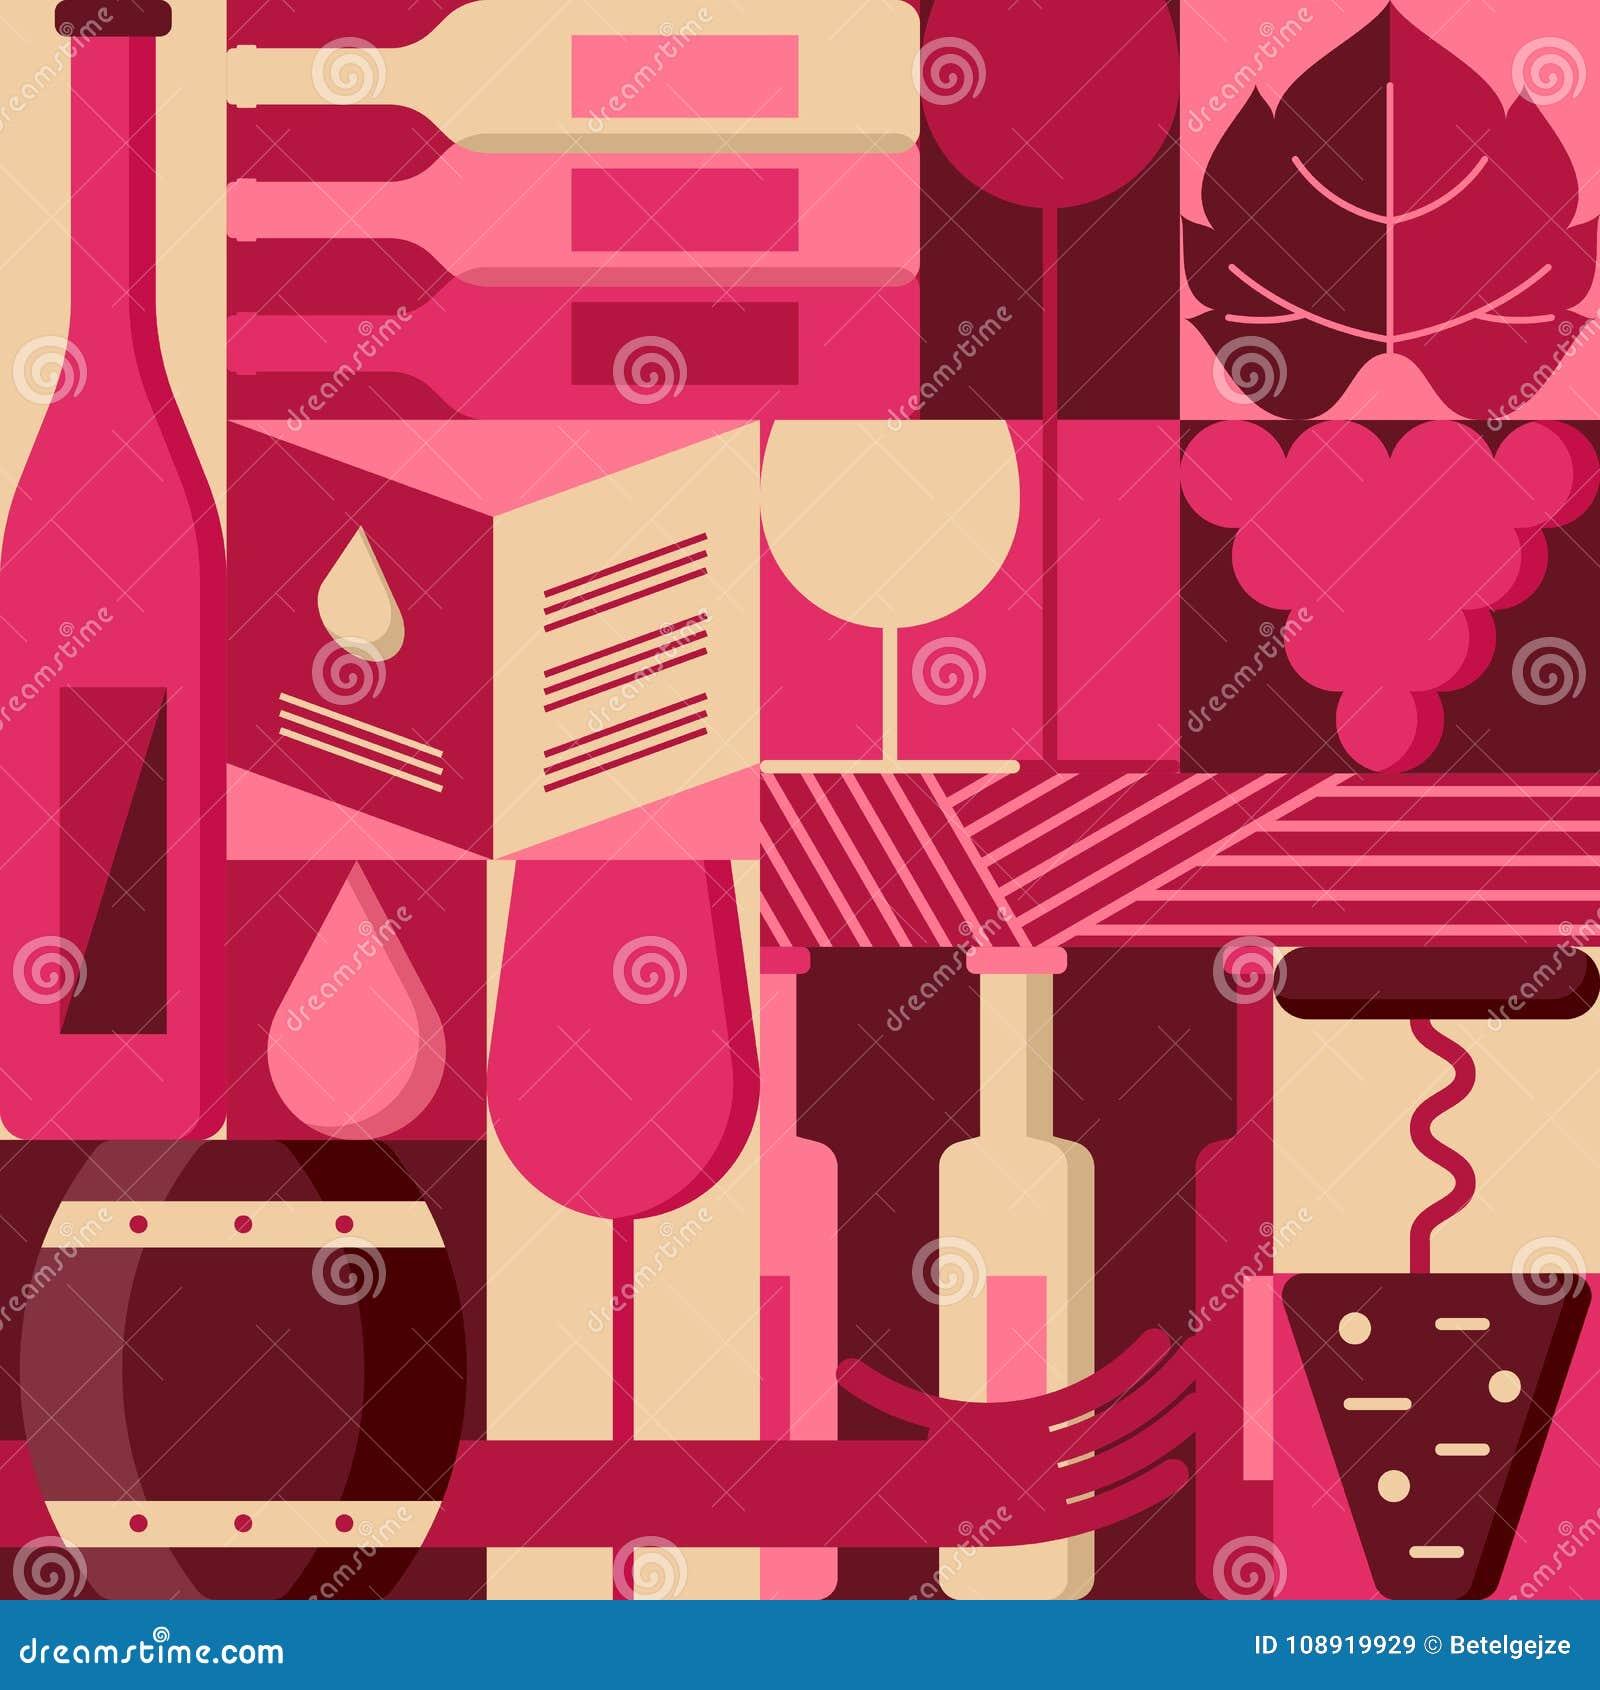 vector flat design elements for wine list, label, packaging, bar